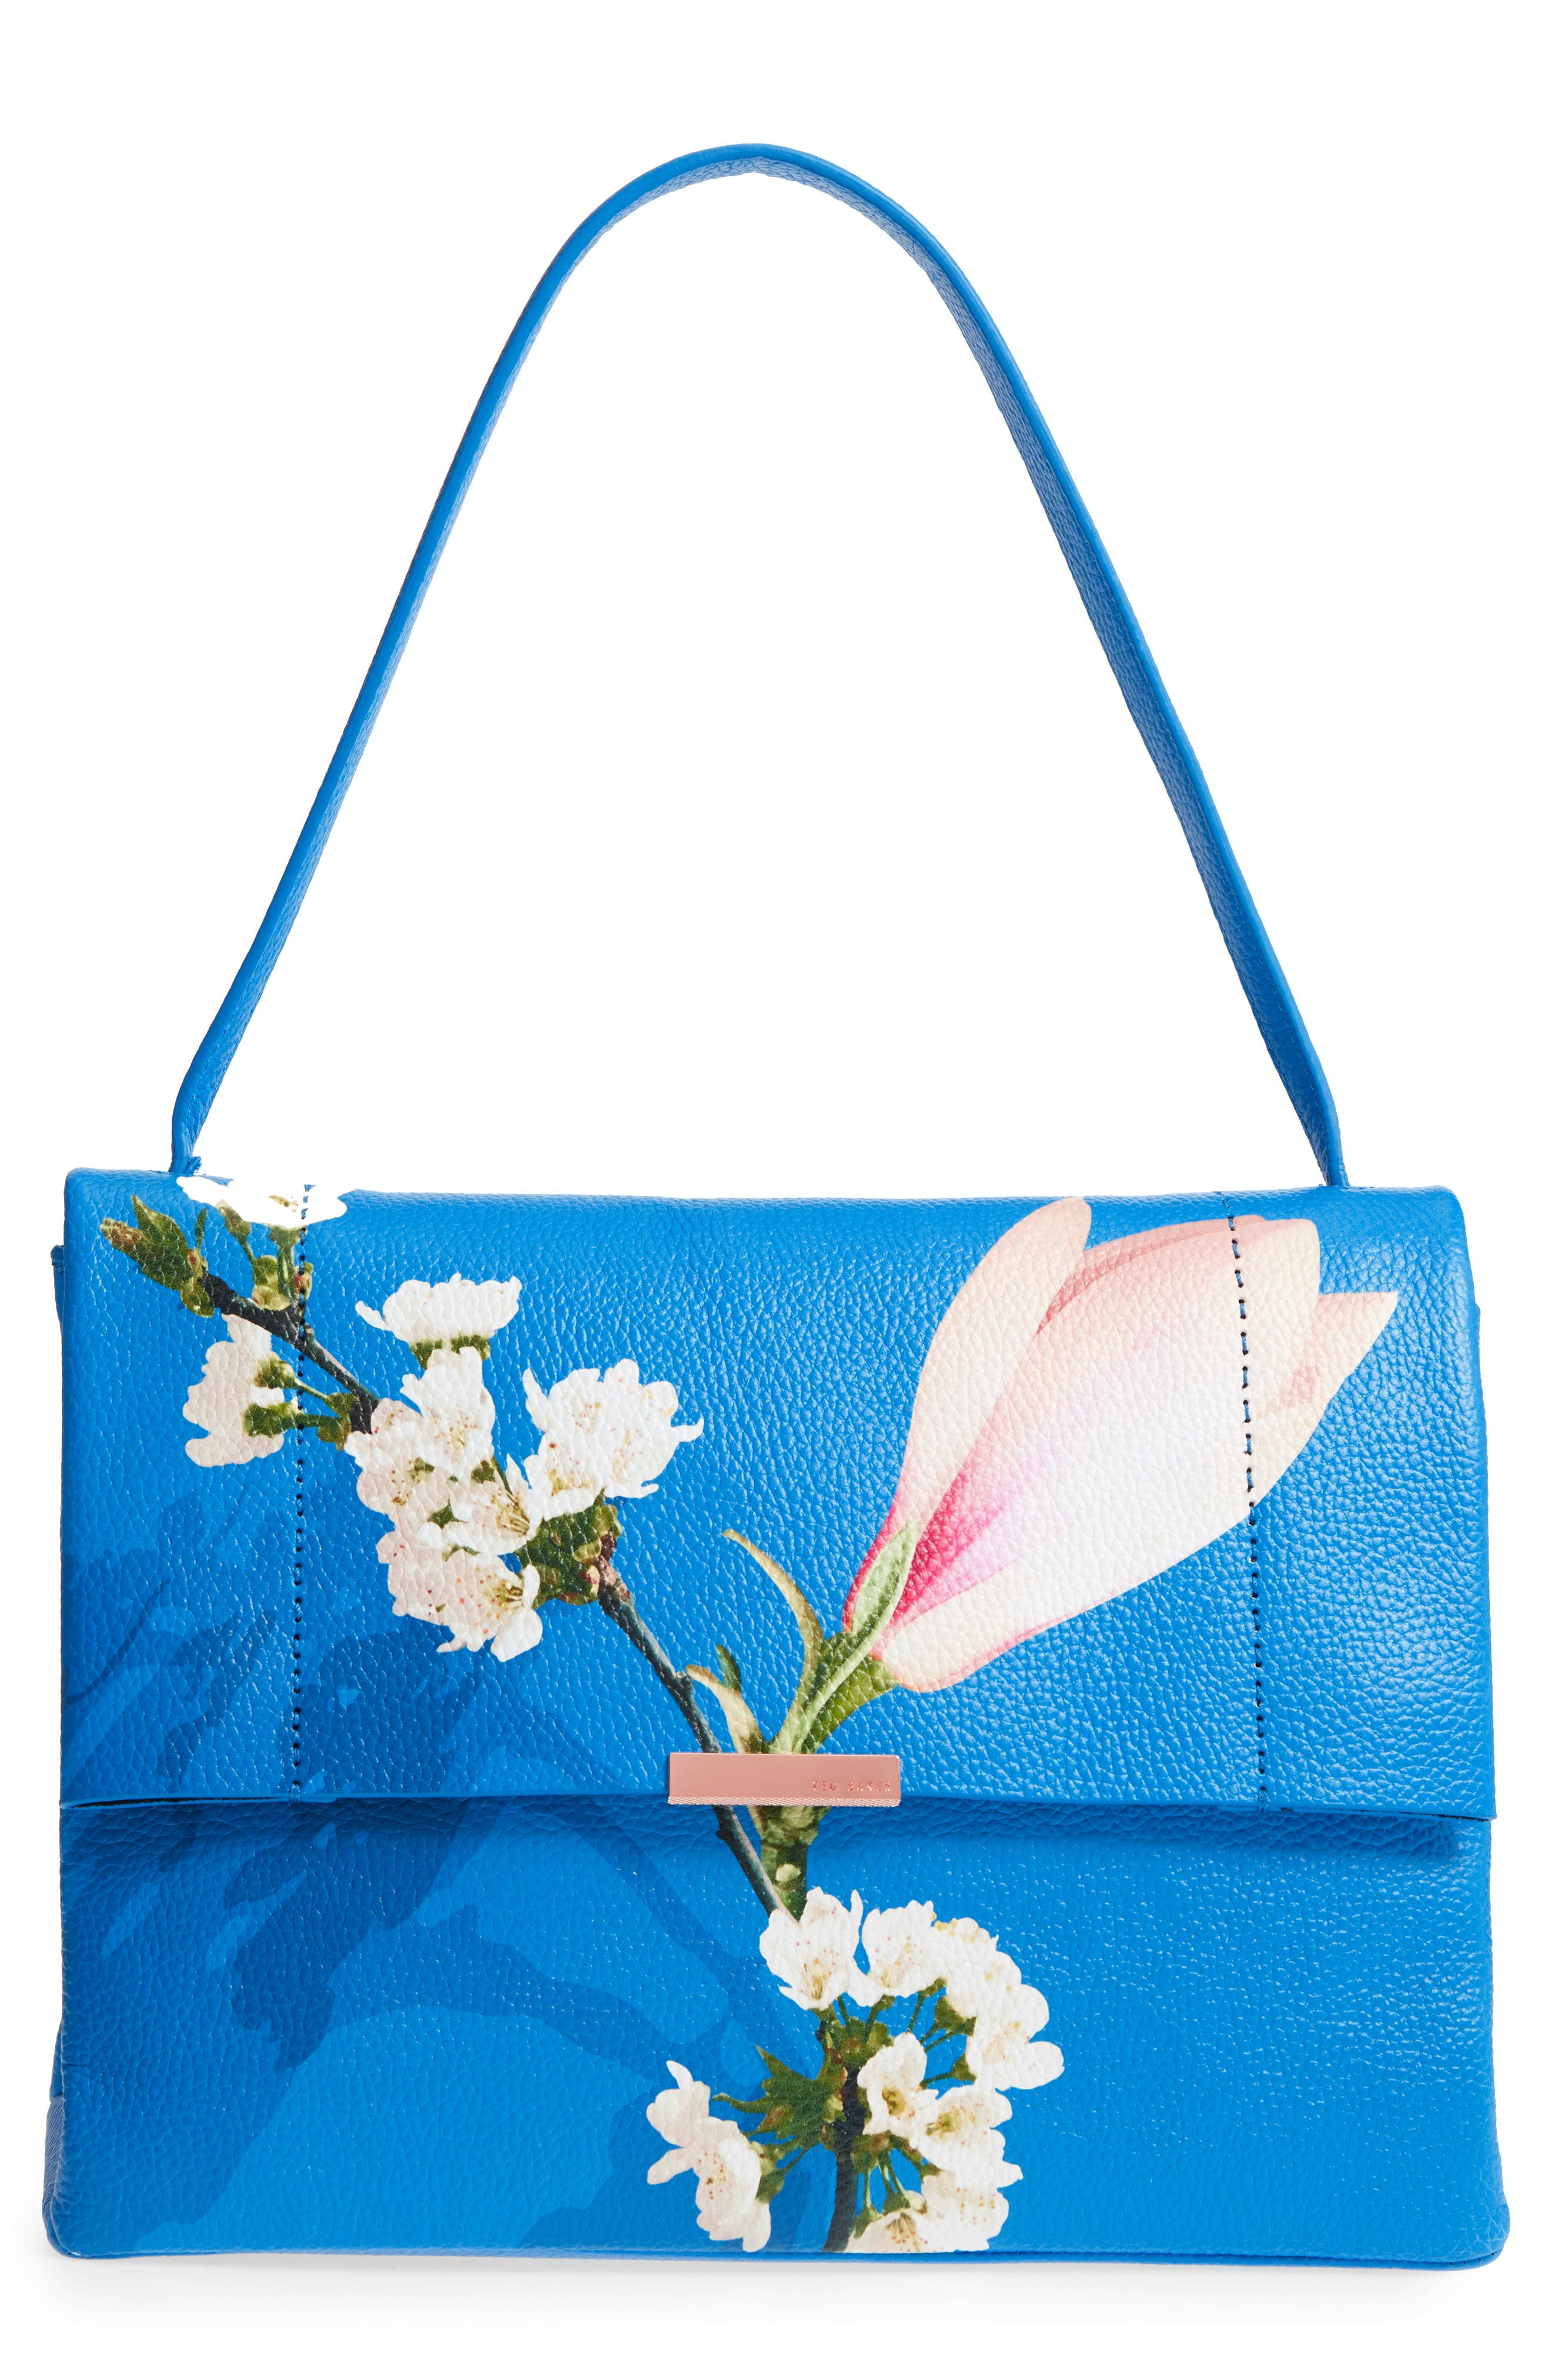 Heeidi Harmony Print Leather Shoulder Bag,                         Main,                         color, 430